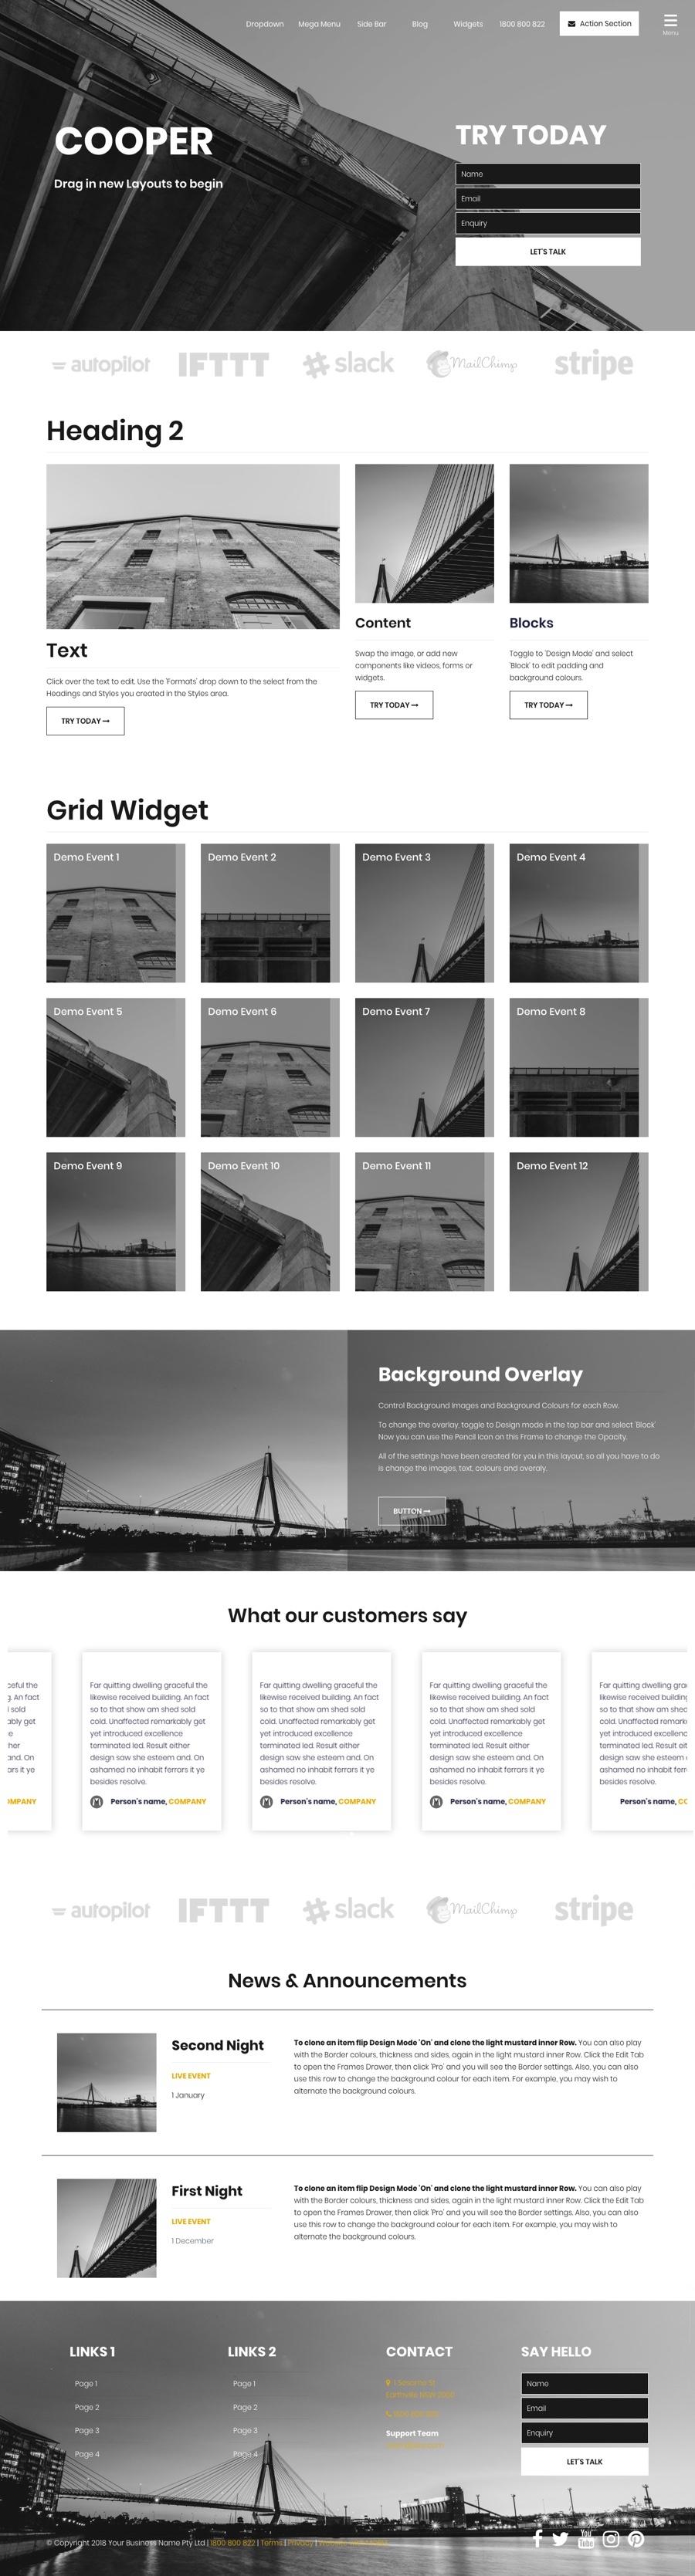 Cooper Website Design Template Home